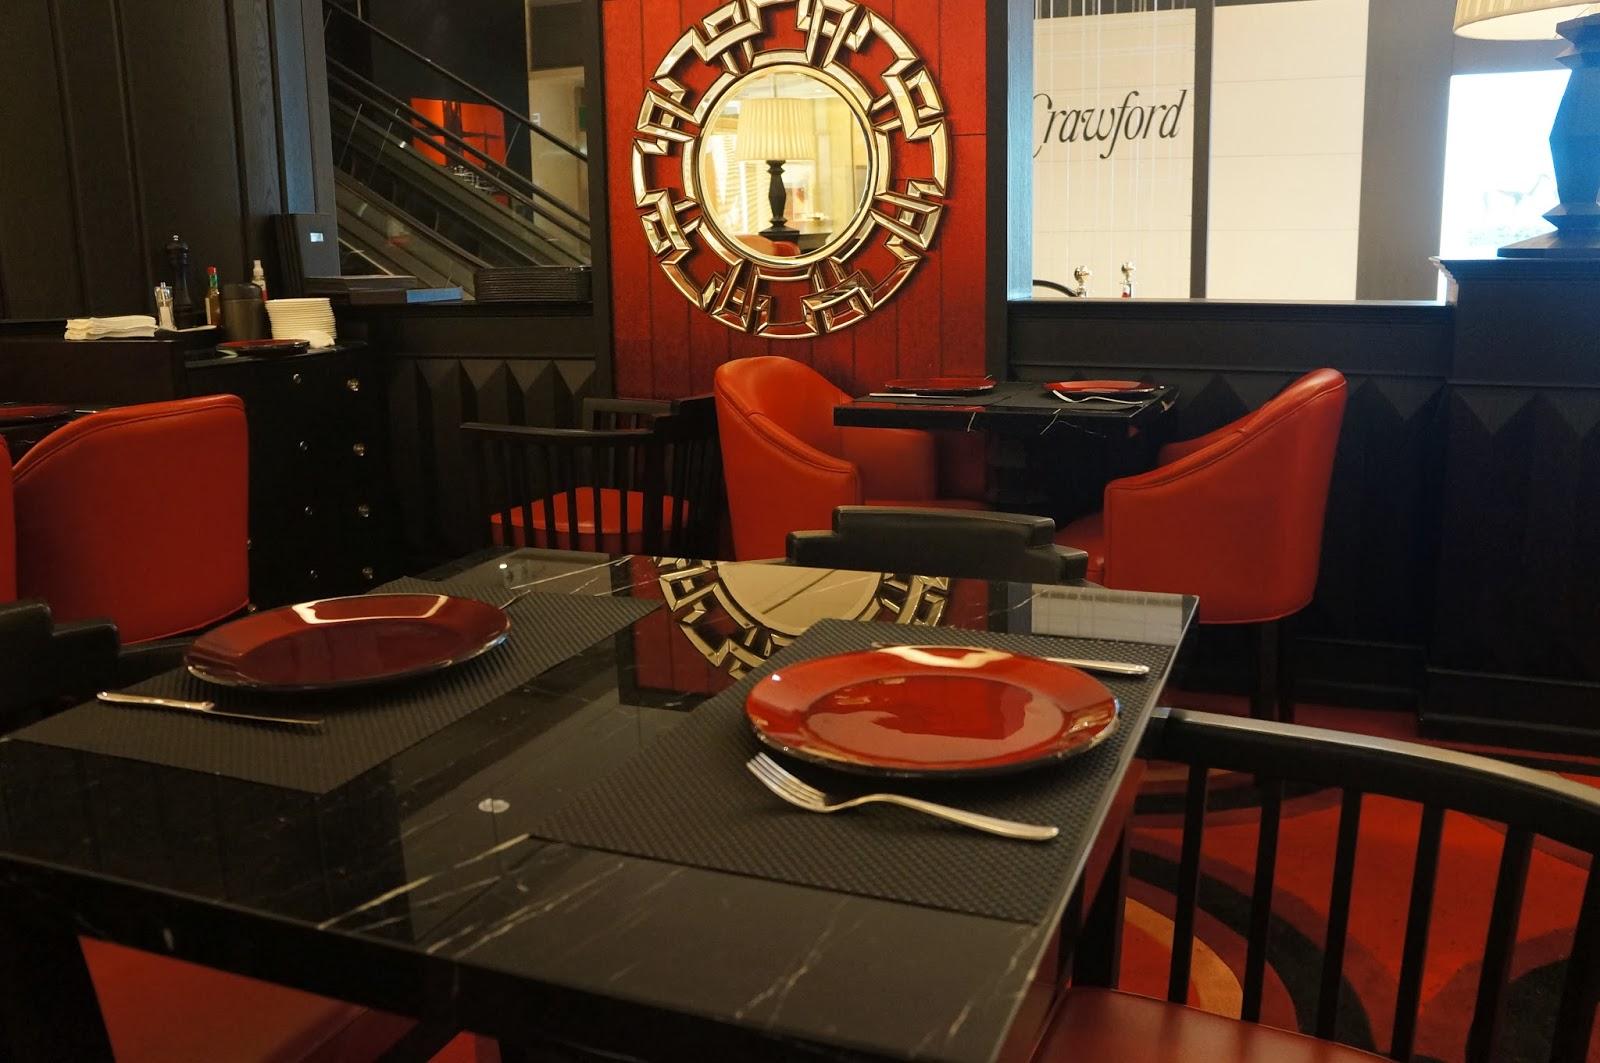 Ministry of gluttony salon de joel robuchon hong kong - Salon de joel robuchon ...